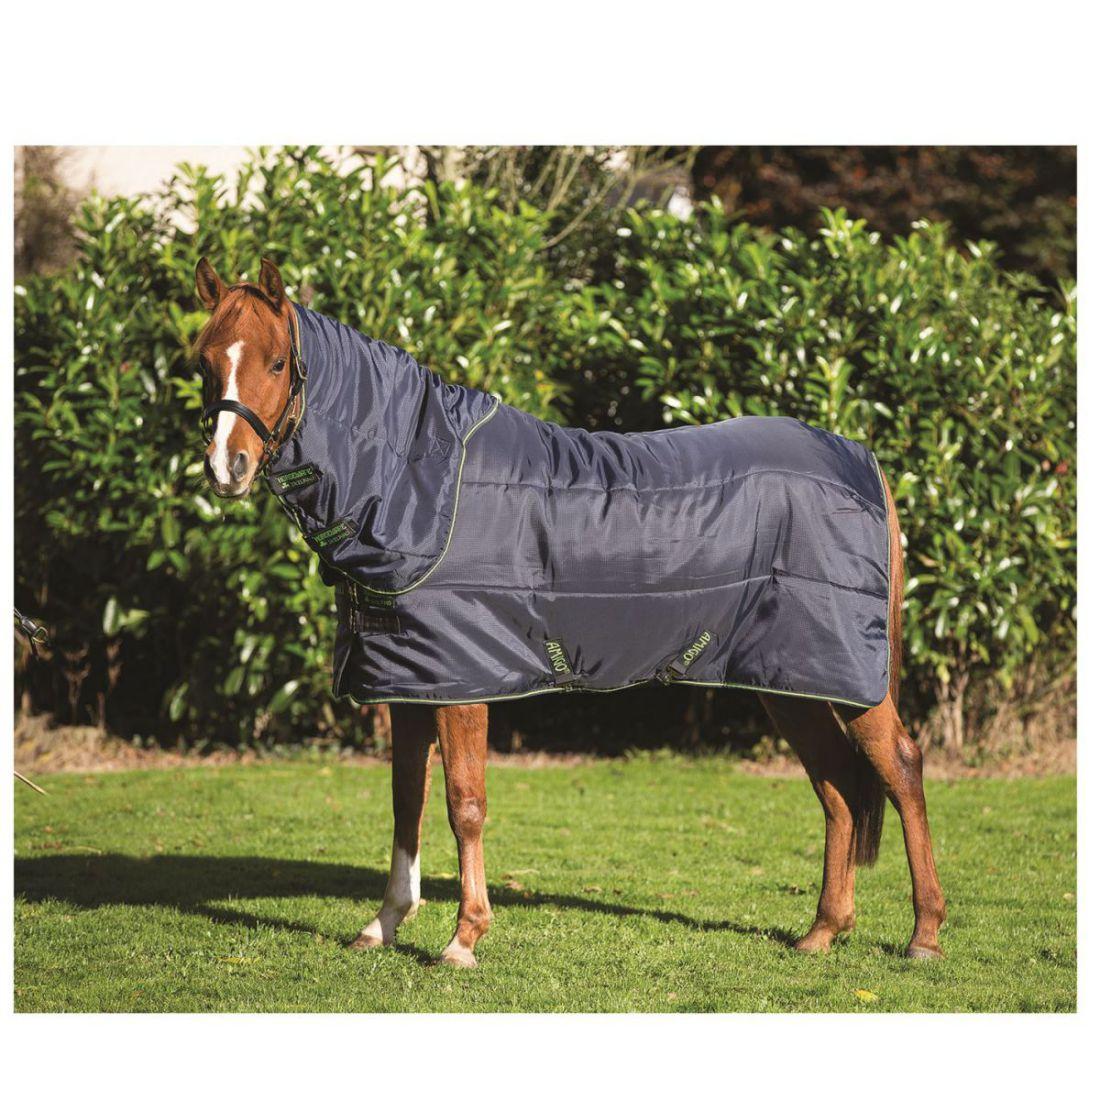 Amigo Unisex Pony Insulator Plus Medium 200g Horse Rug Breathable Classic Shine